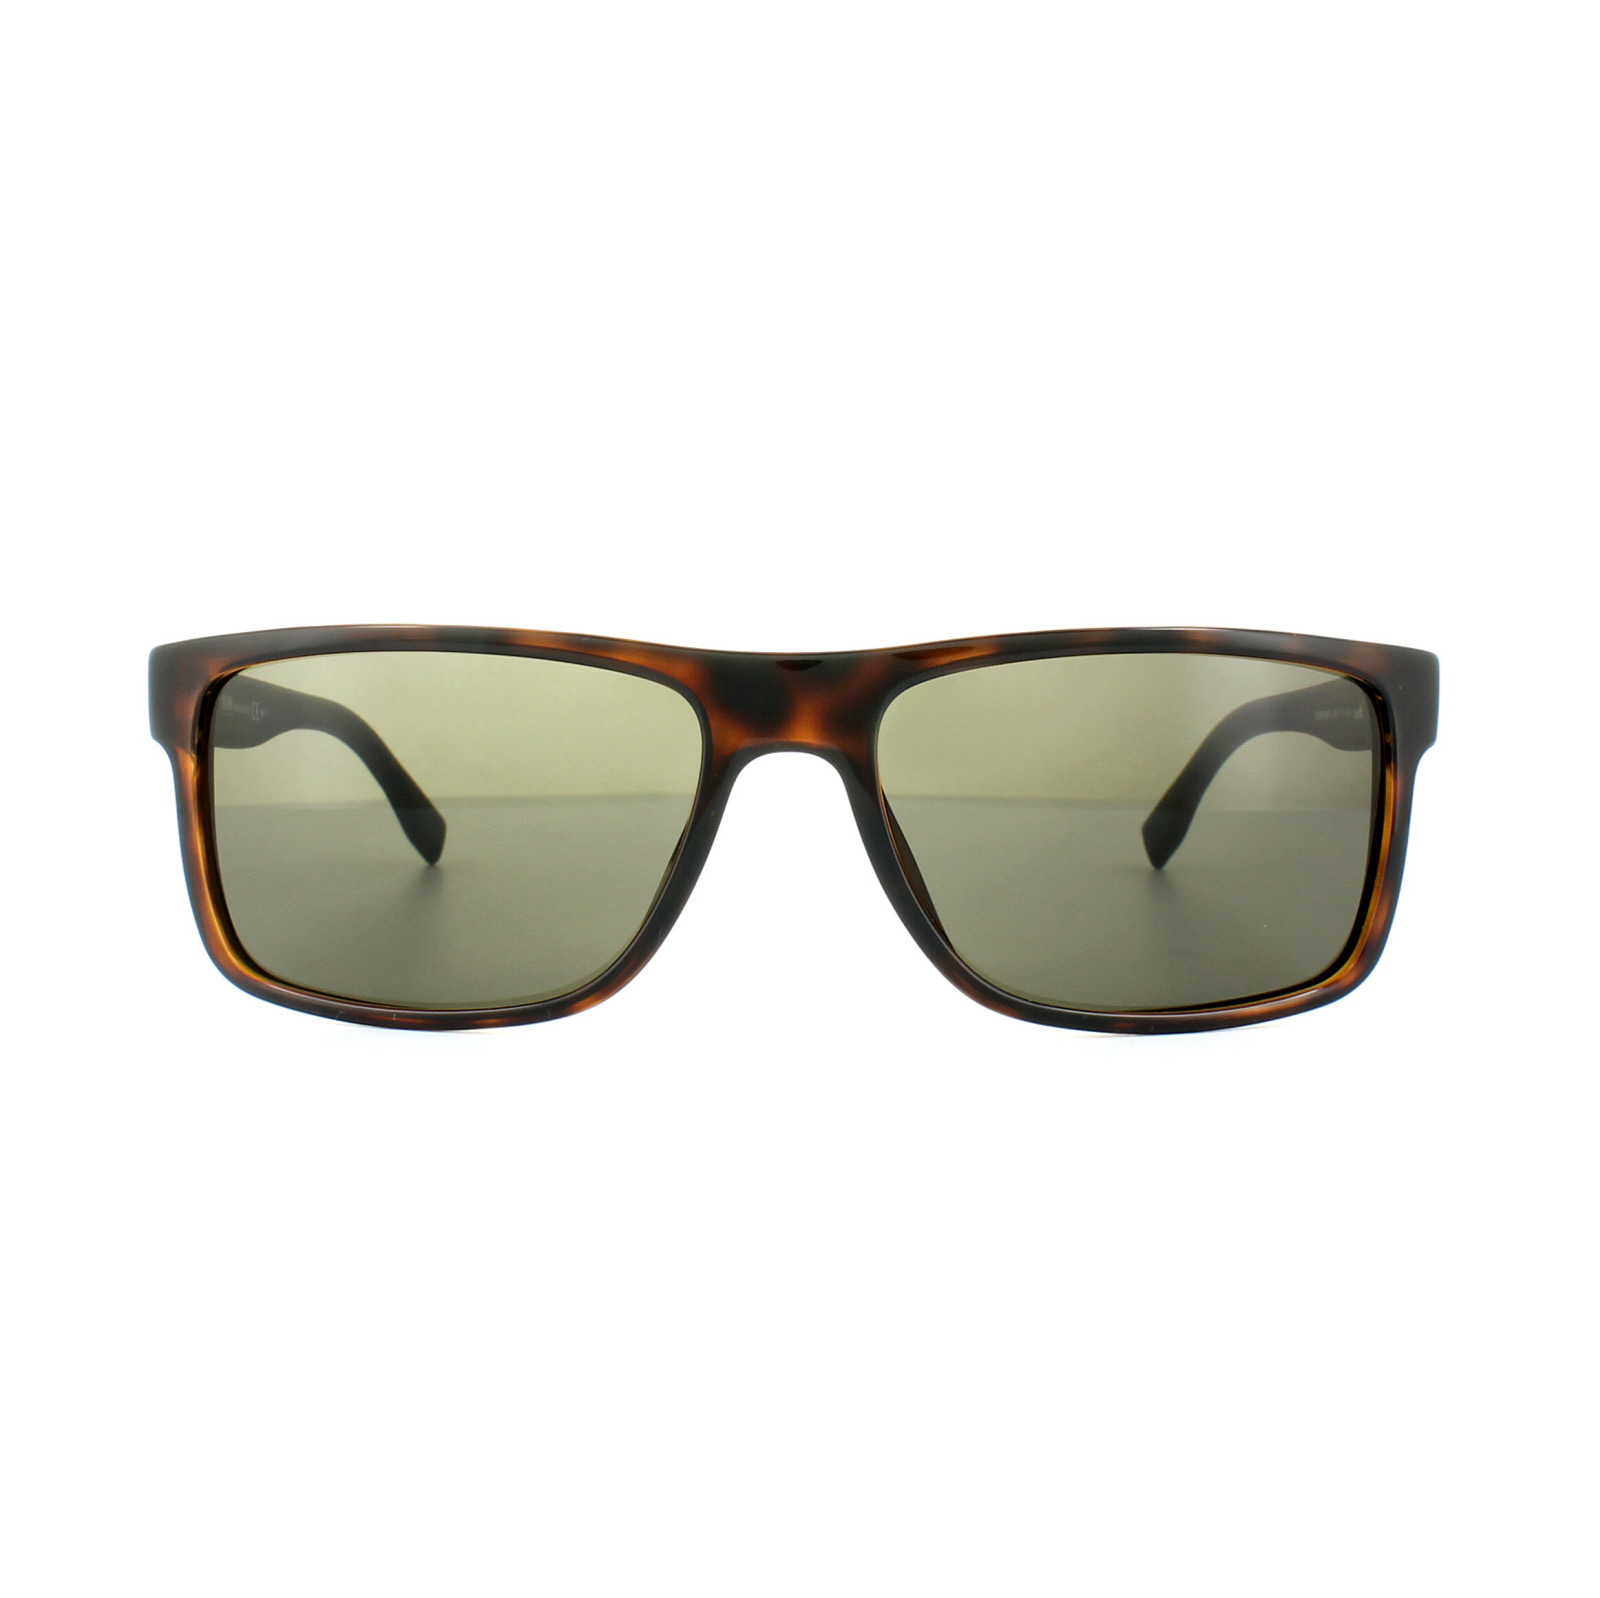 0d702bd4f60 Hugo Boss 0919 Sunglasses Thumbnail 1 Hugo Boss 0919 Sunglasses Thumbnail 2  ...